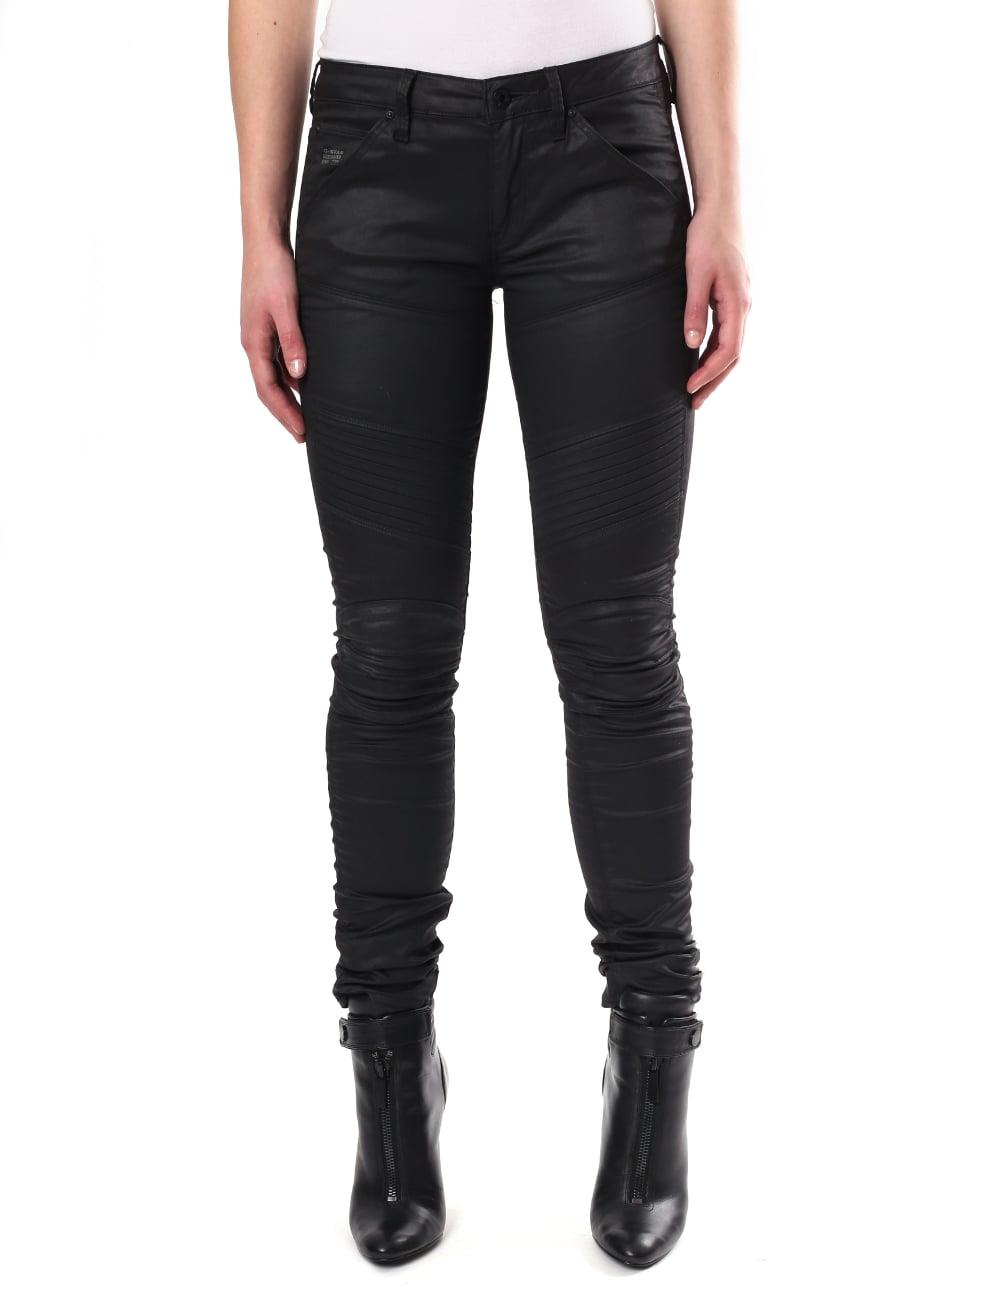 G Star Raw Women's 5620 Custom Skinny Fit Jeans